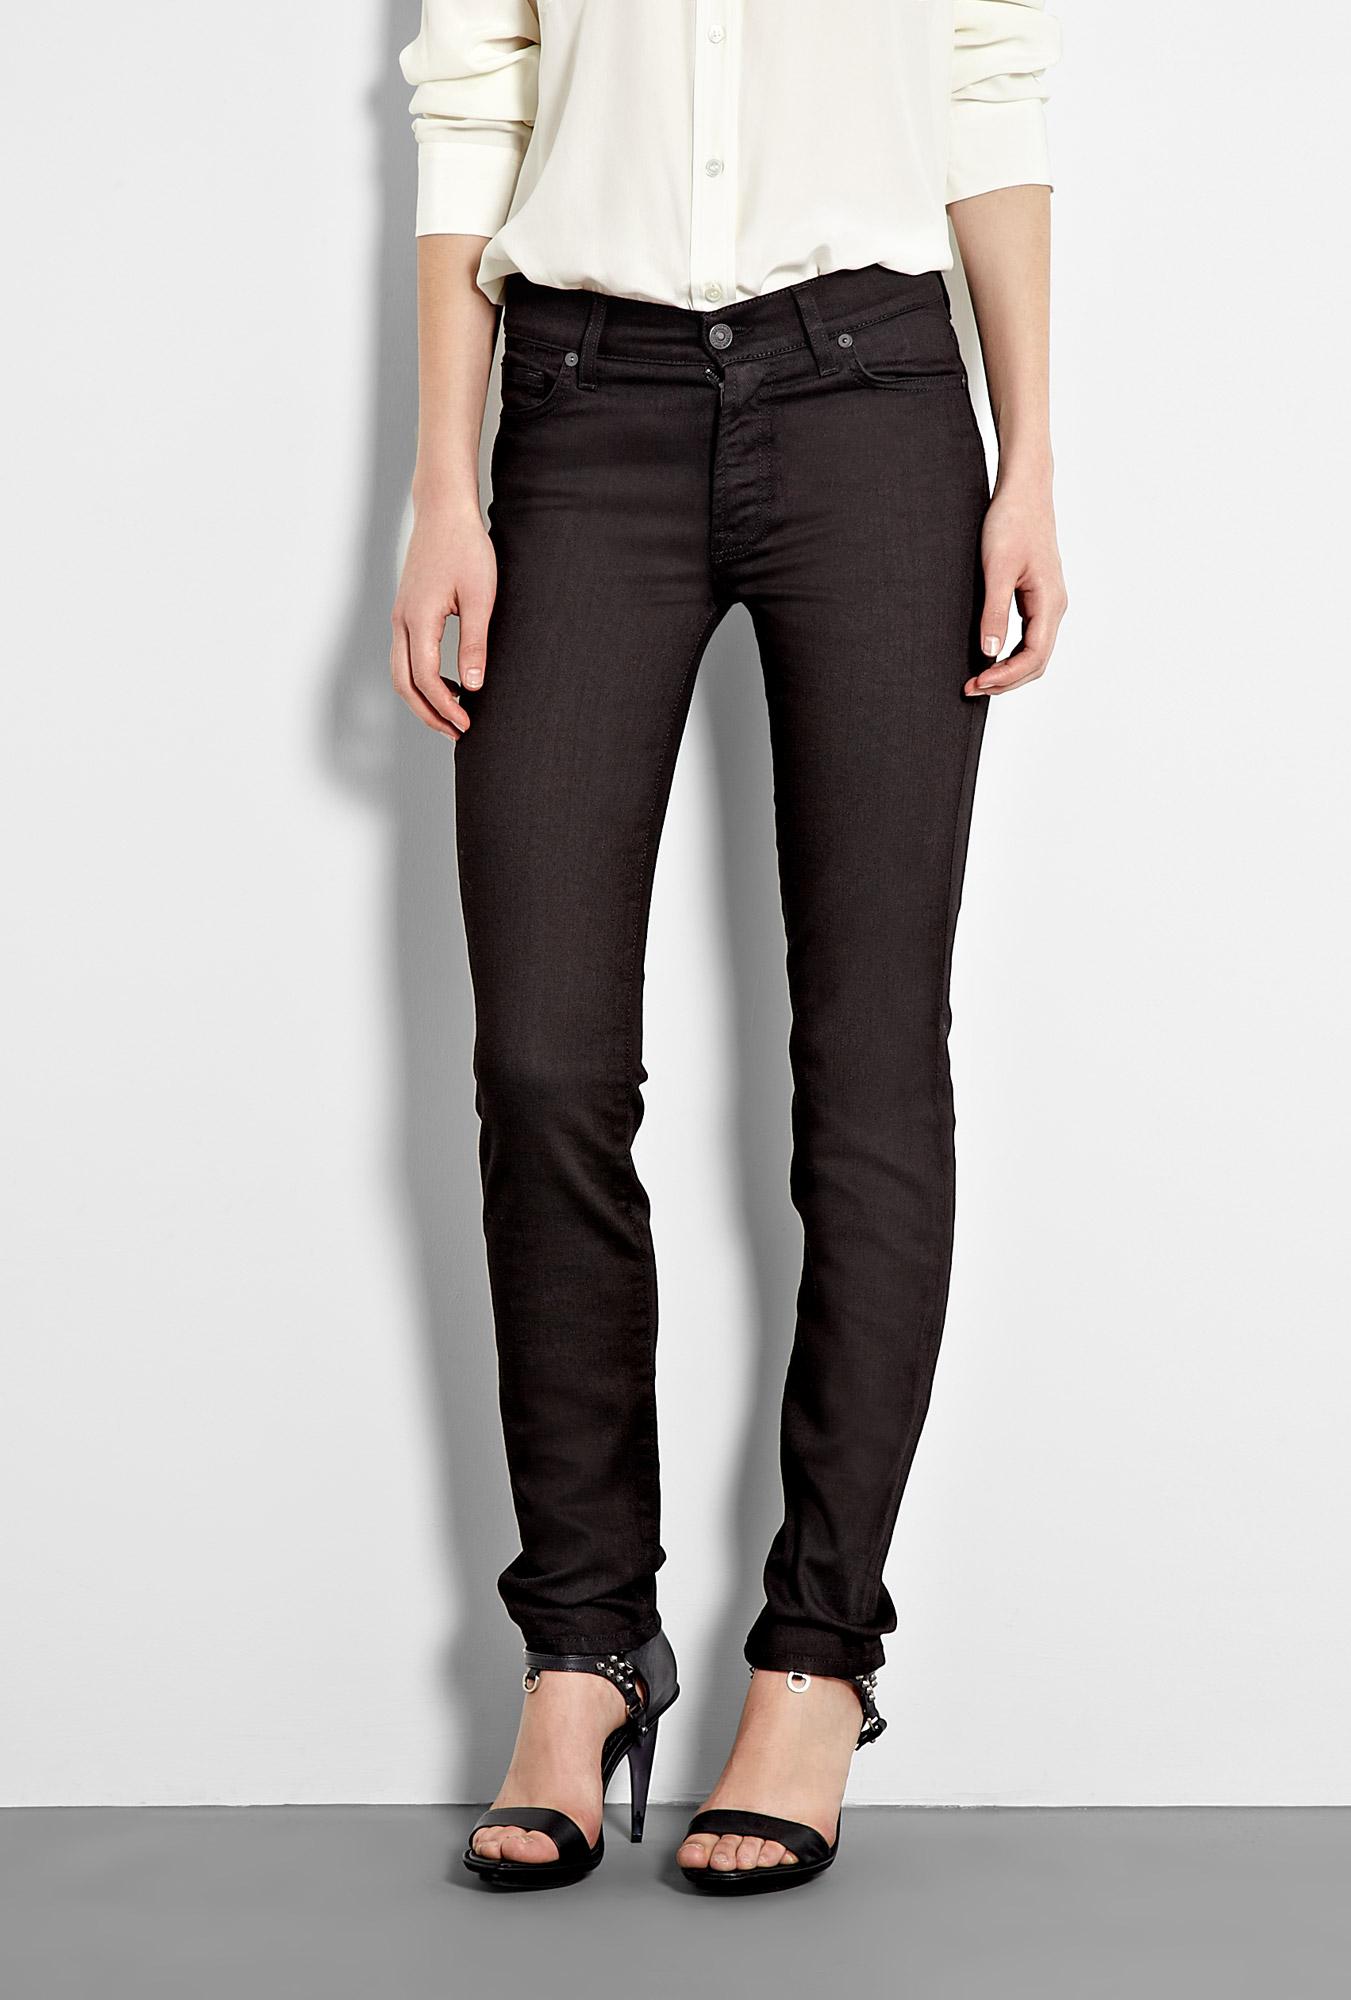 7 for all mankind mid rise roxanne black skinny jean in. Black Bedroom Furniture Sets. Home Design Ideas